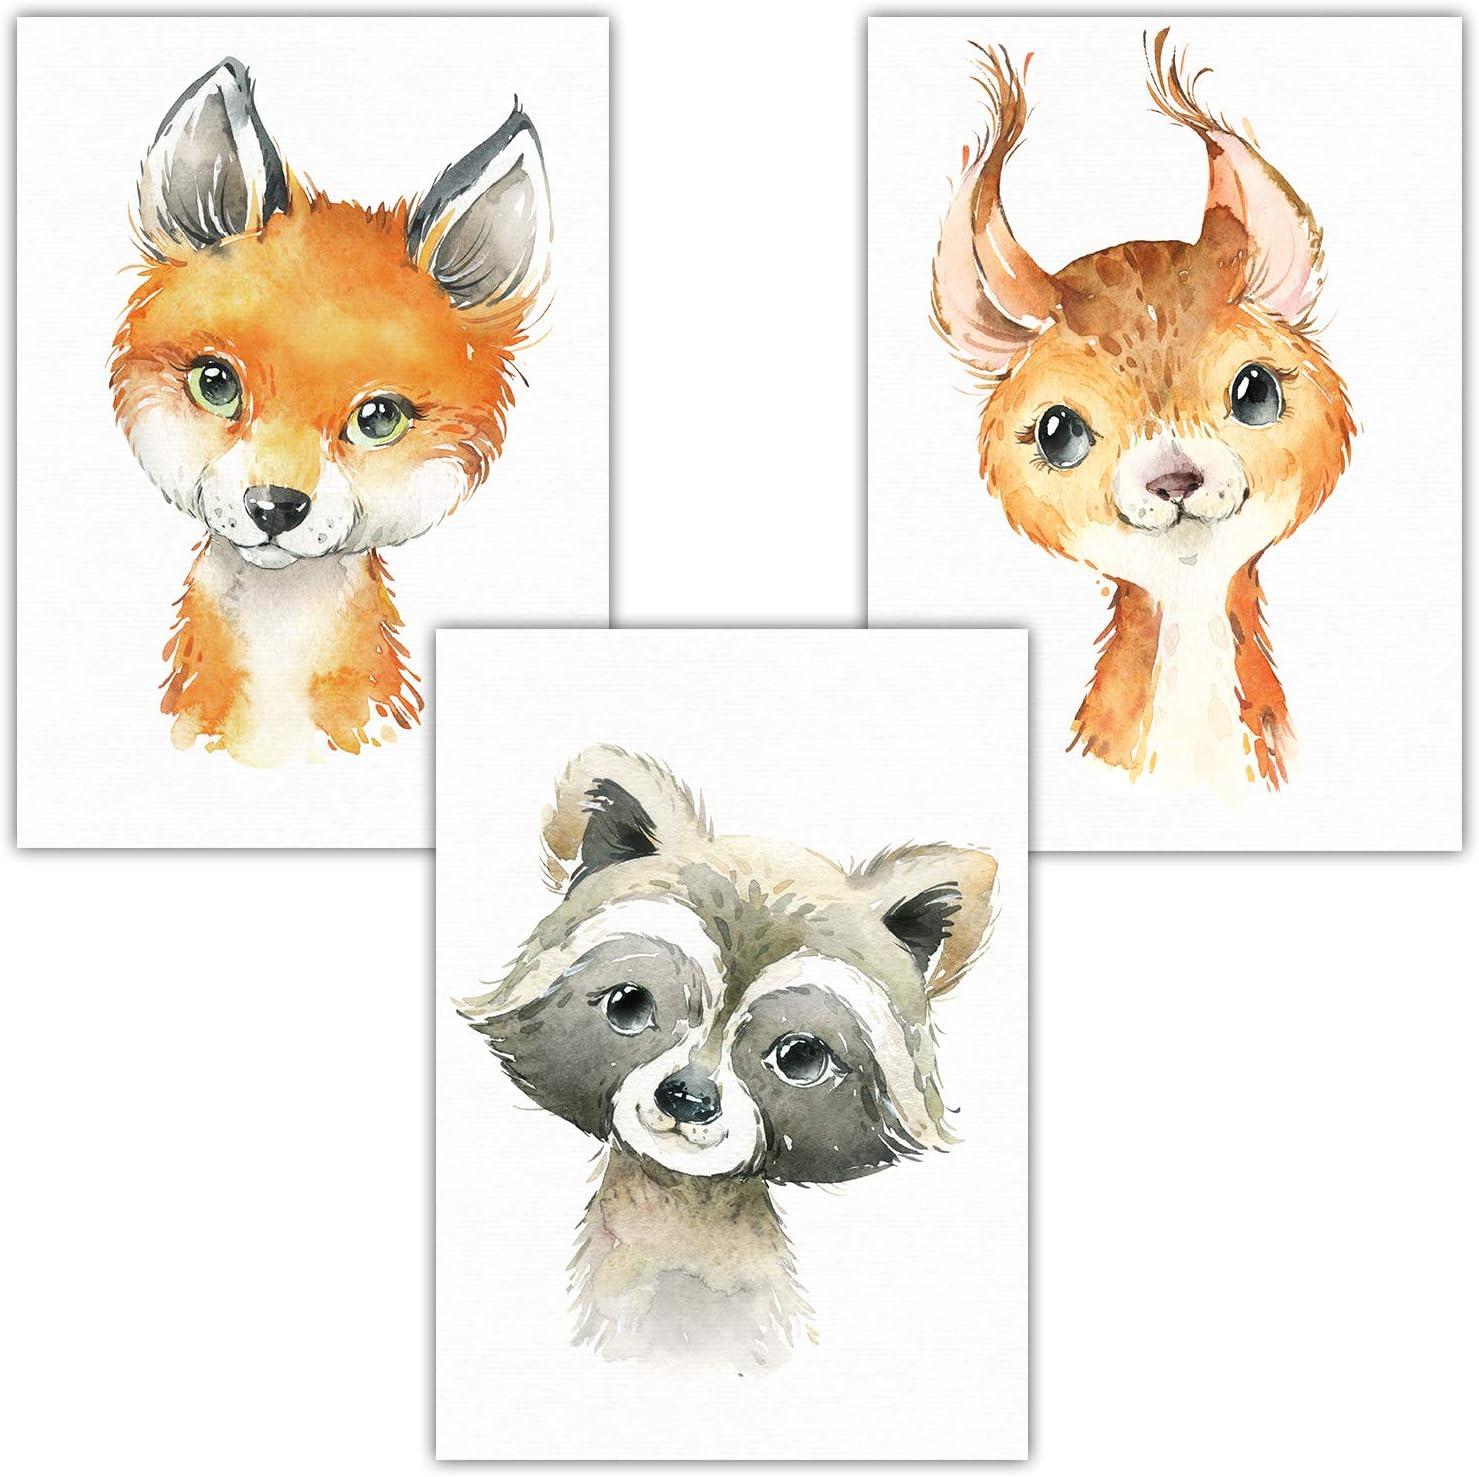 Juego de 4 p/ósteres decorativos para habitaci/ón infantil /África dise/ño de animales del bosque Frechdax/® DIN A4 safari estrellas. nube Juego de 4 azul tama/ño DIN A4